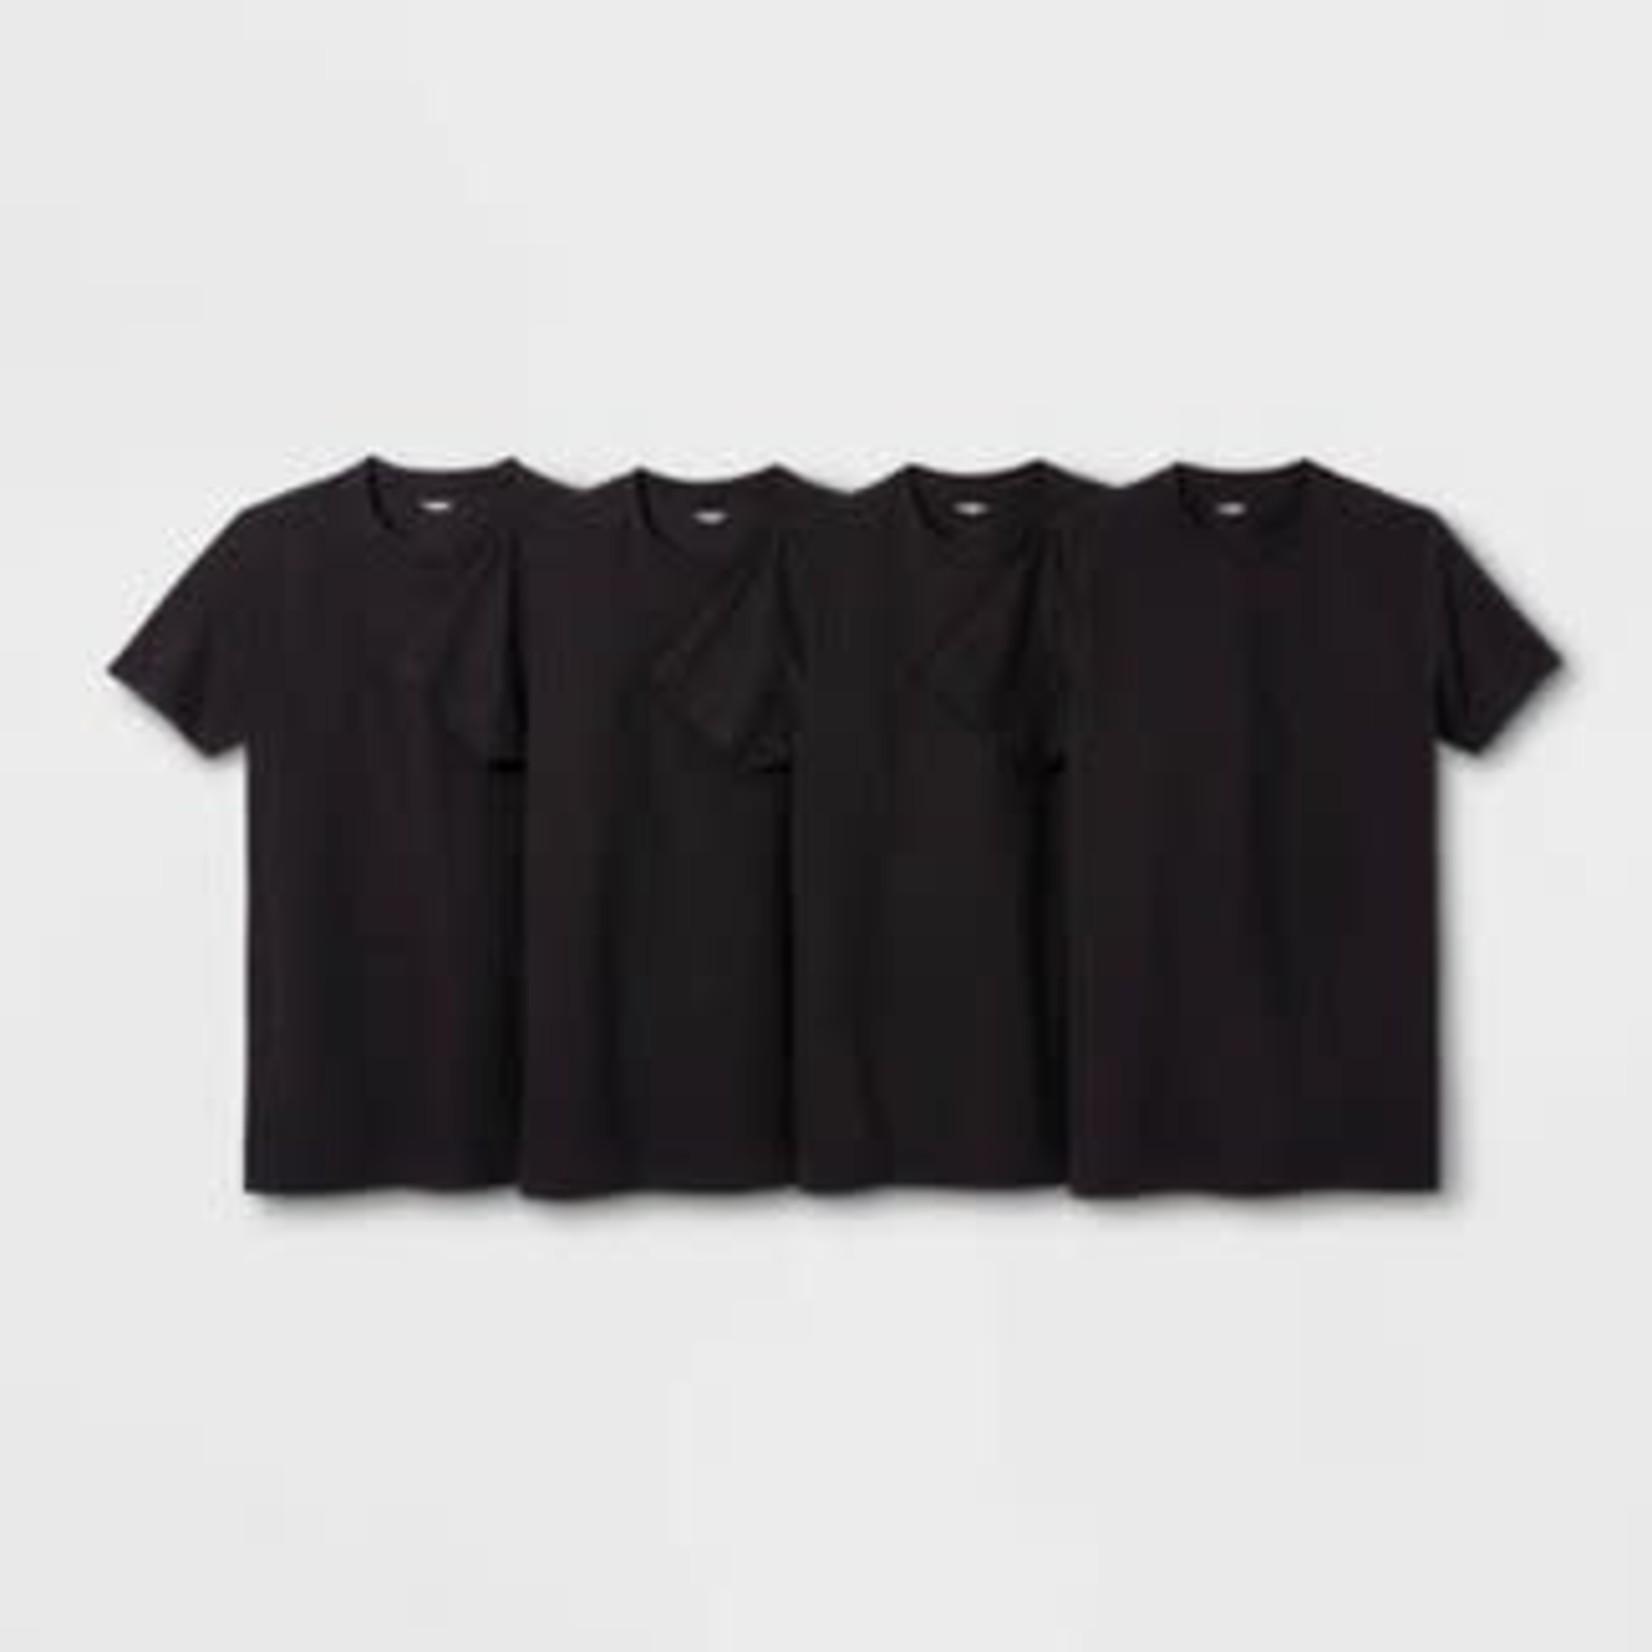 Men's Short Sleeve 4pk Crew-Neck T-Shirt